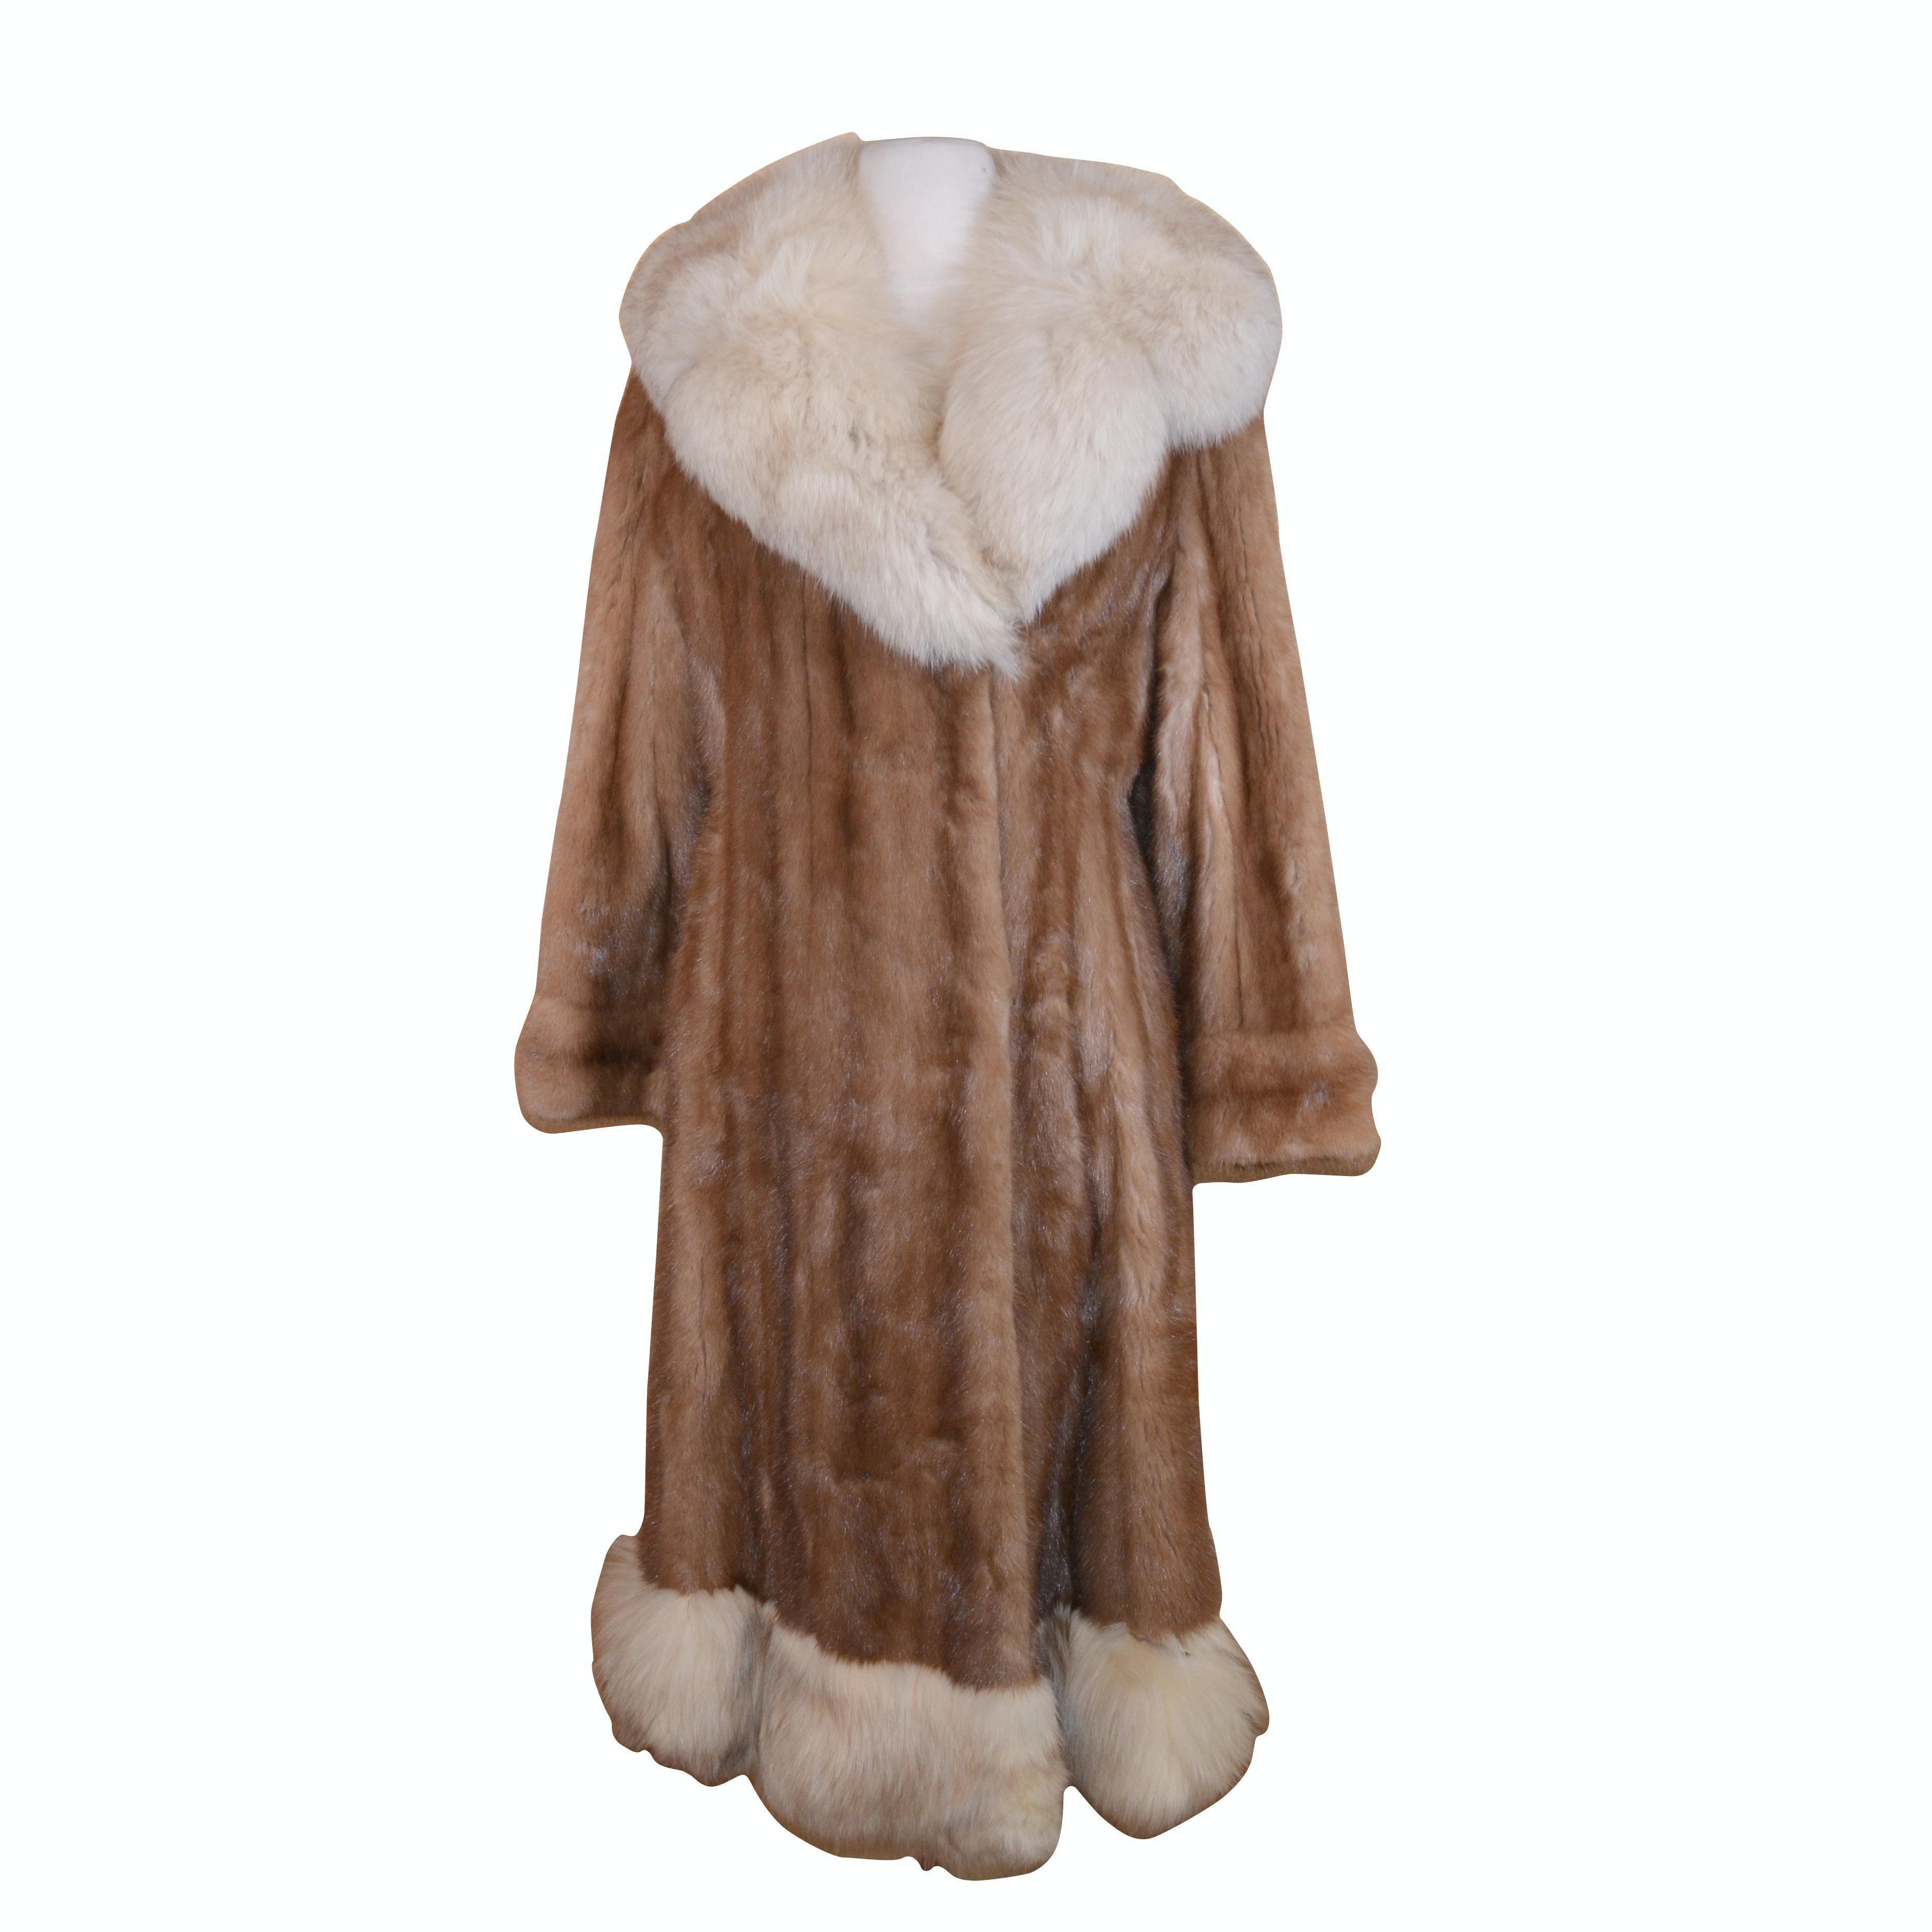 Kay's Shoppe Marten and Fox Fur Coat, Vintage